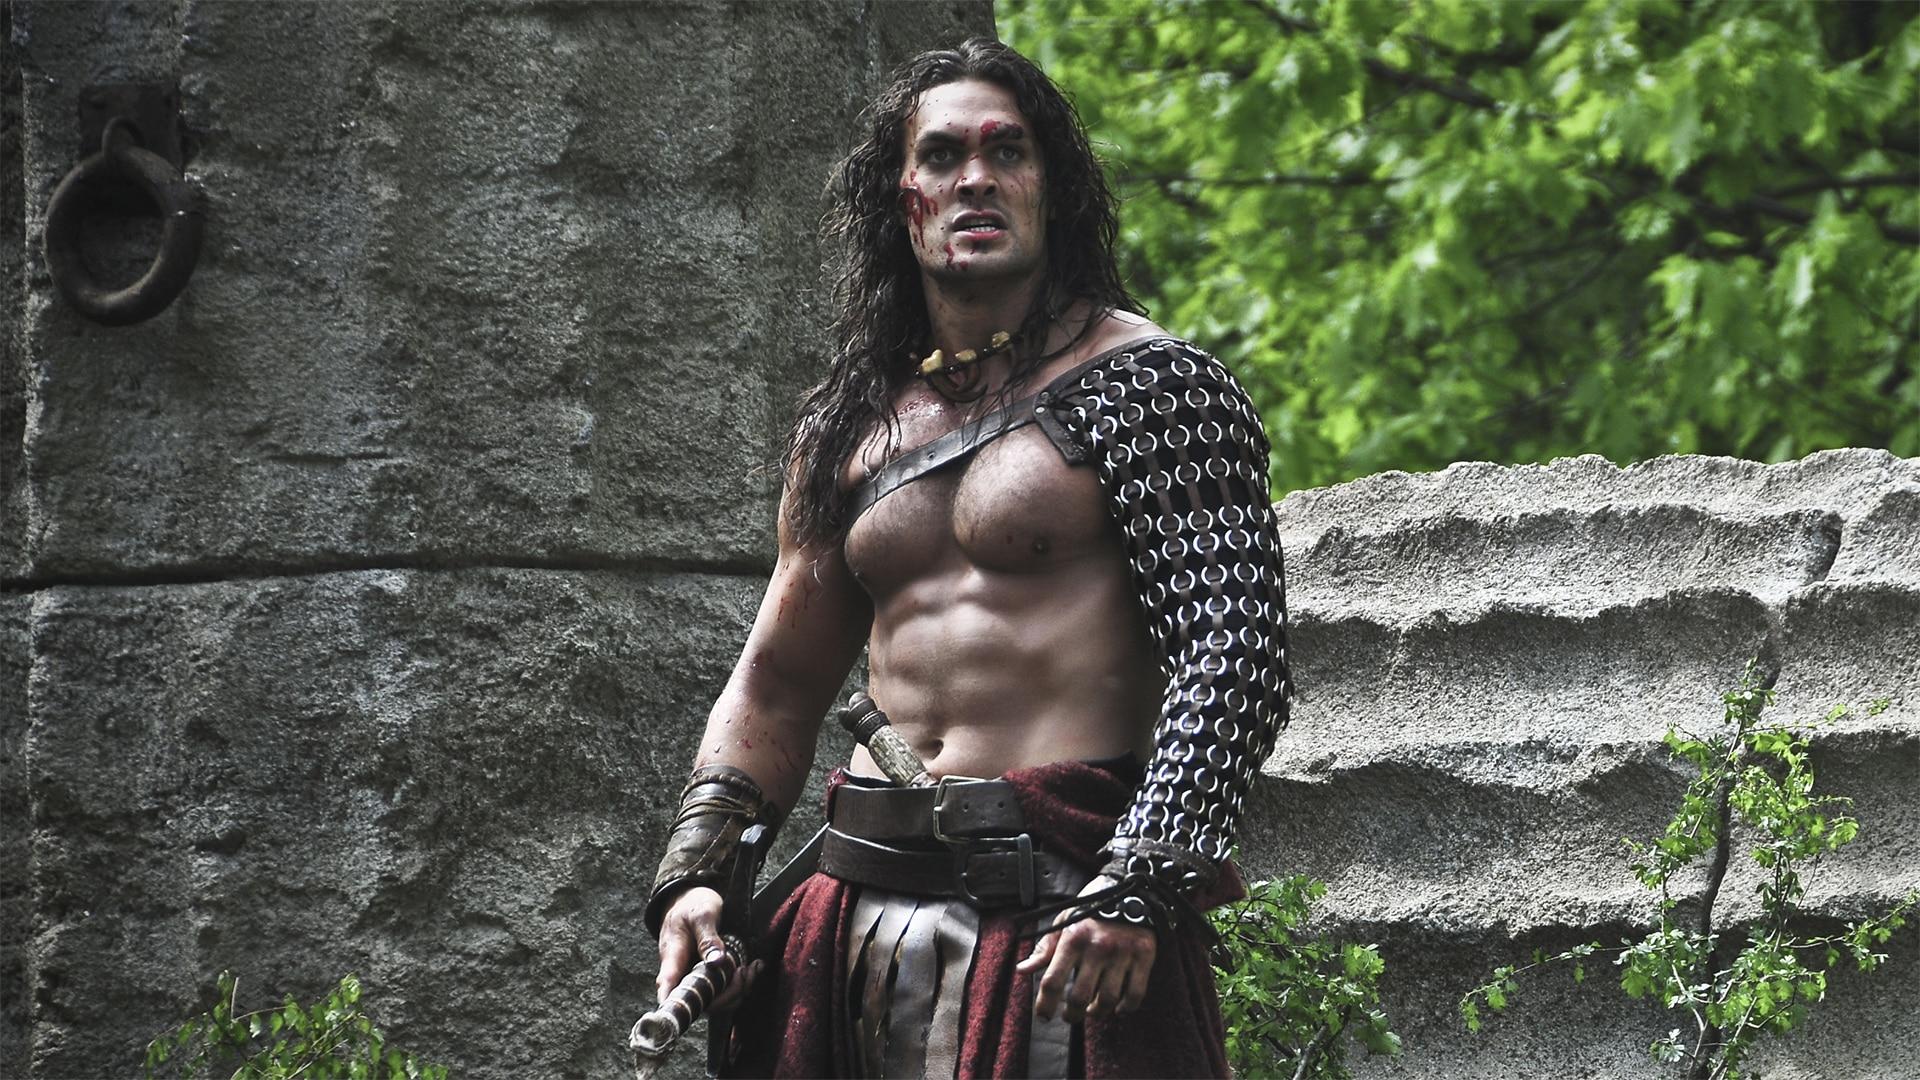 Conan the Barbarian (2011) - All 4